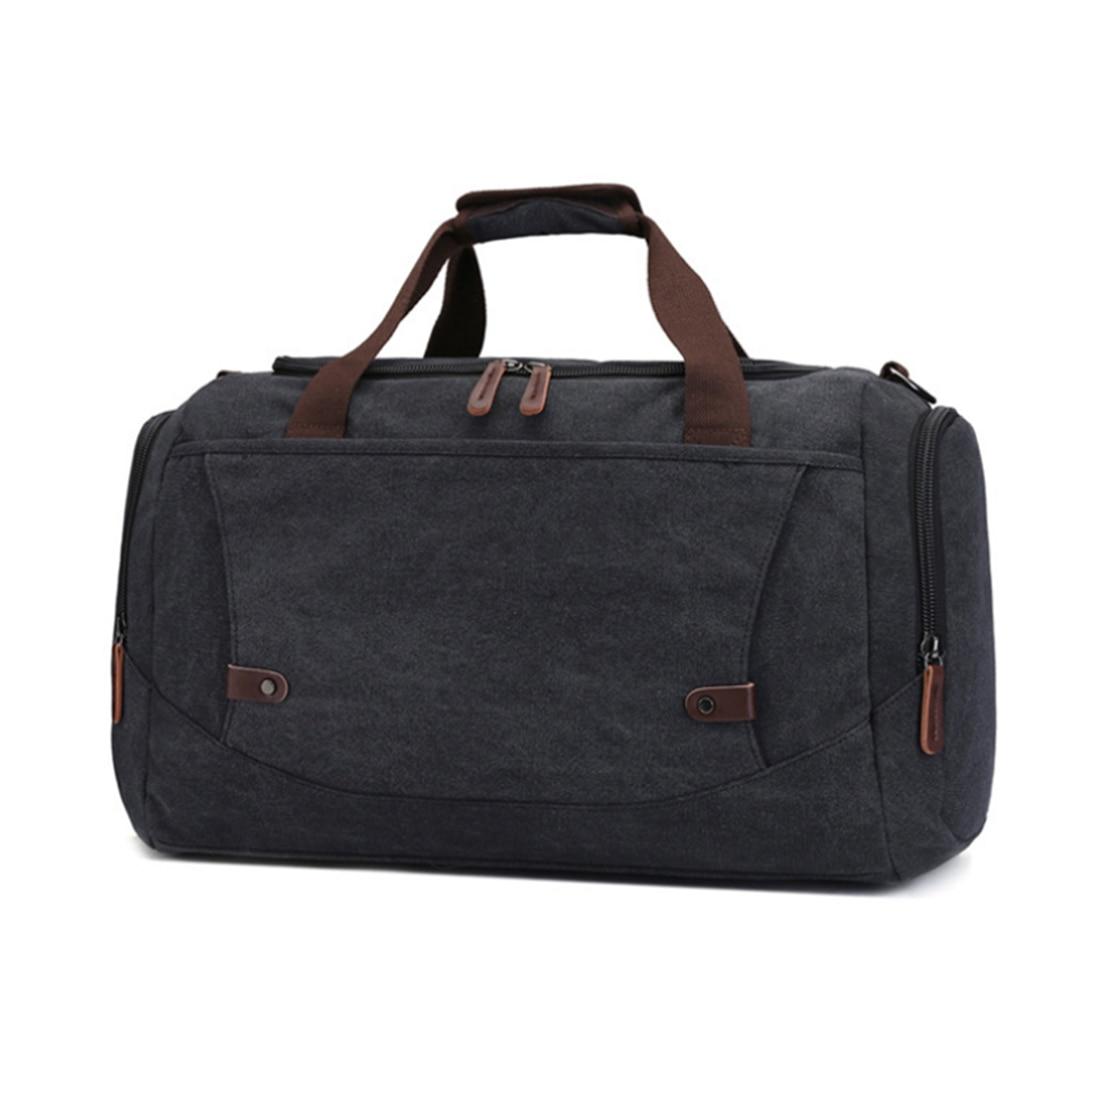 Men's Bag Male Travel Bags With Big Capacity Canvas Handbag Travelling Luggage Single-Shoulder Bag Black For Men Teenager Hot